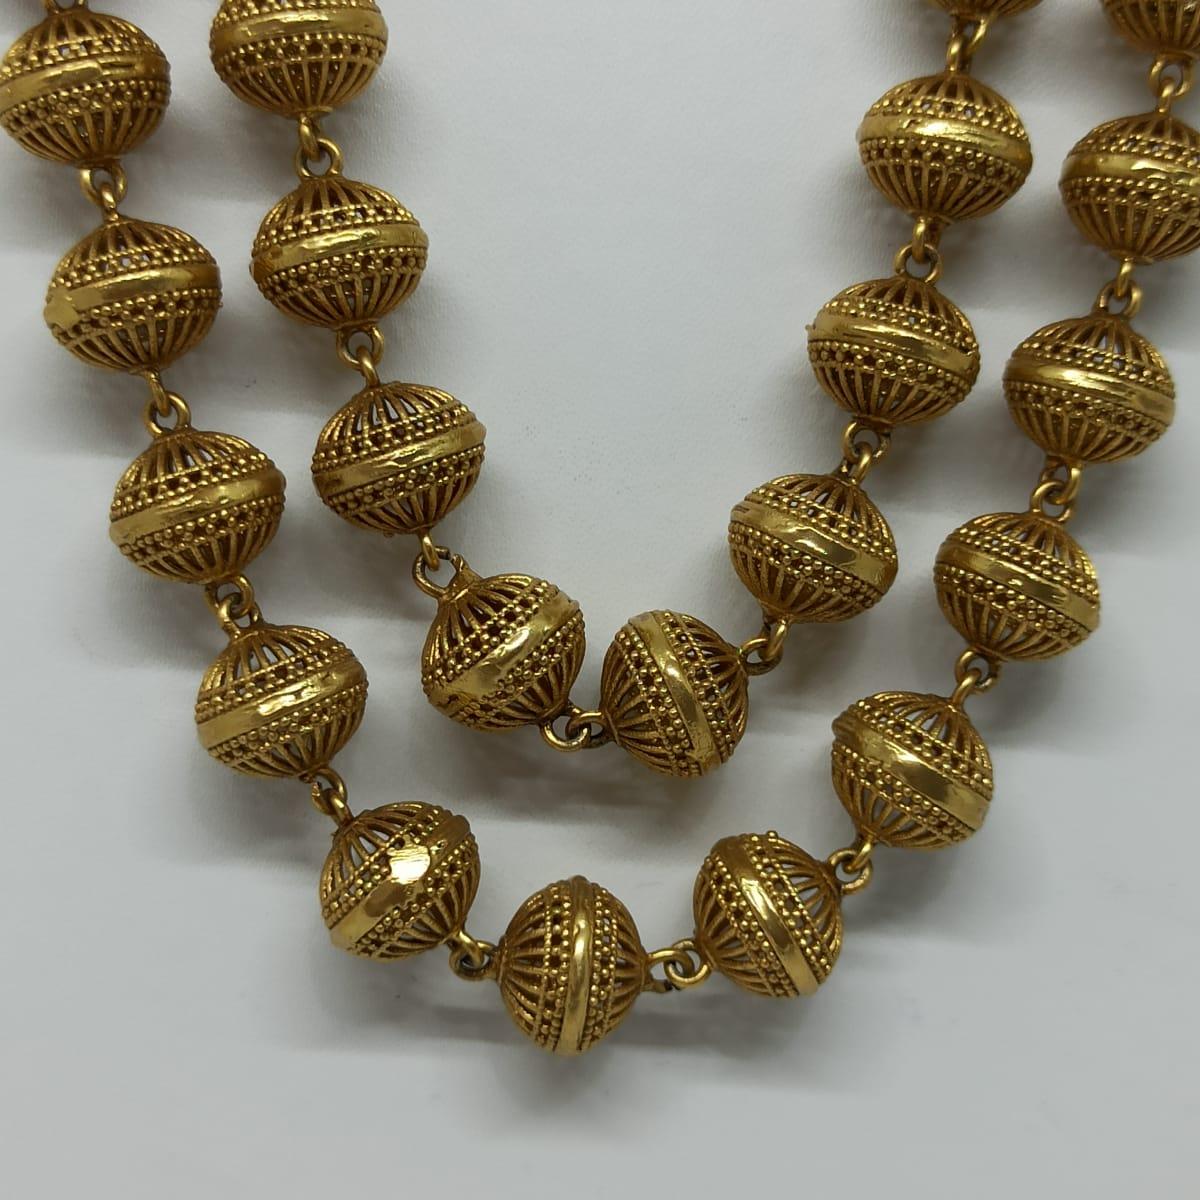 Antique Gundu Necklace